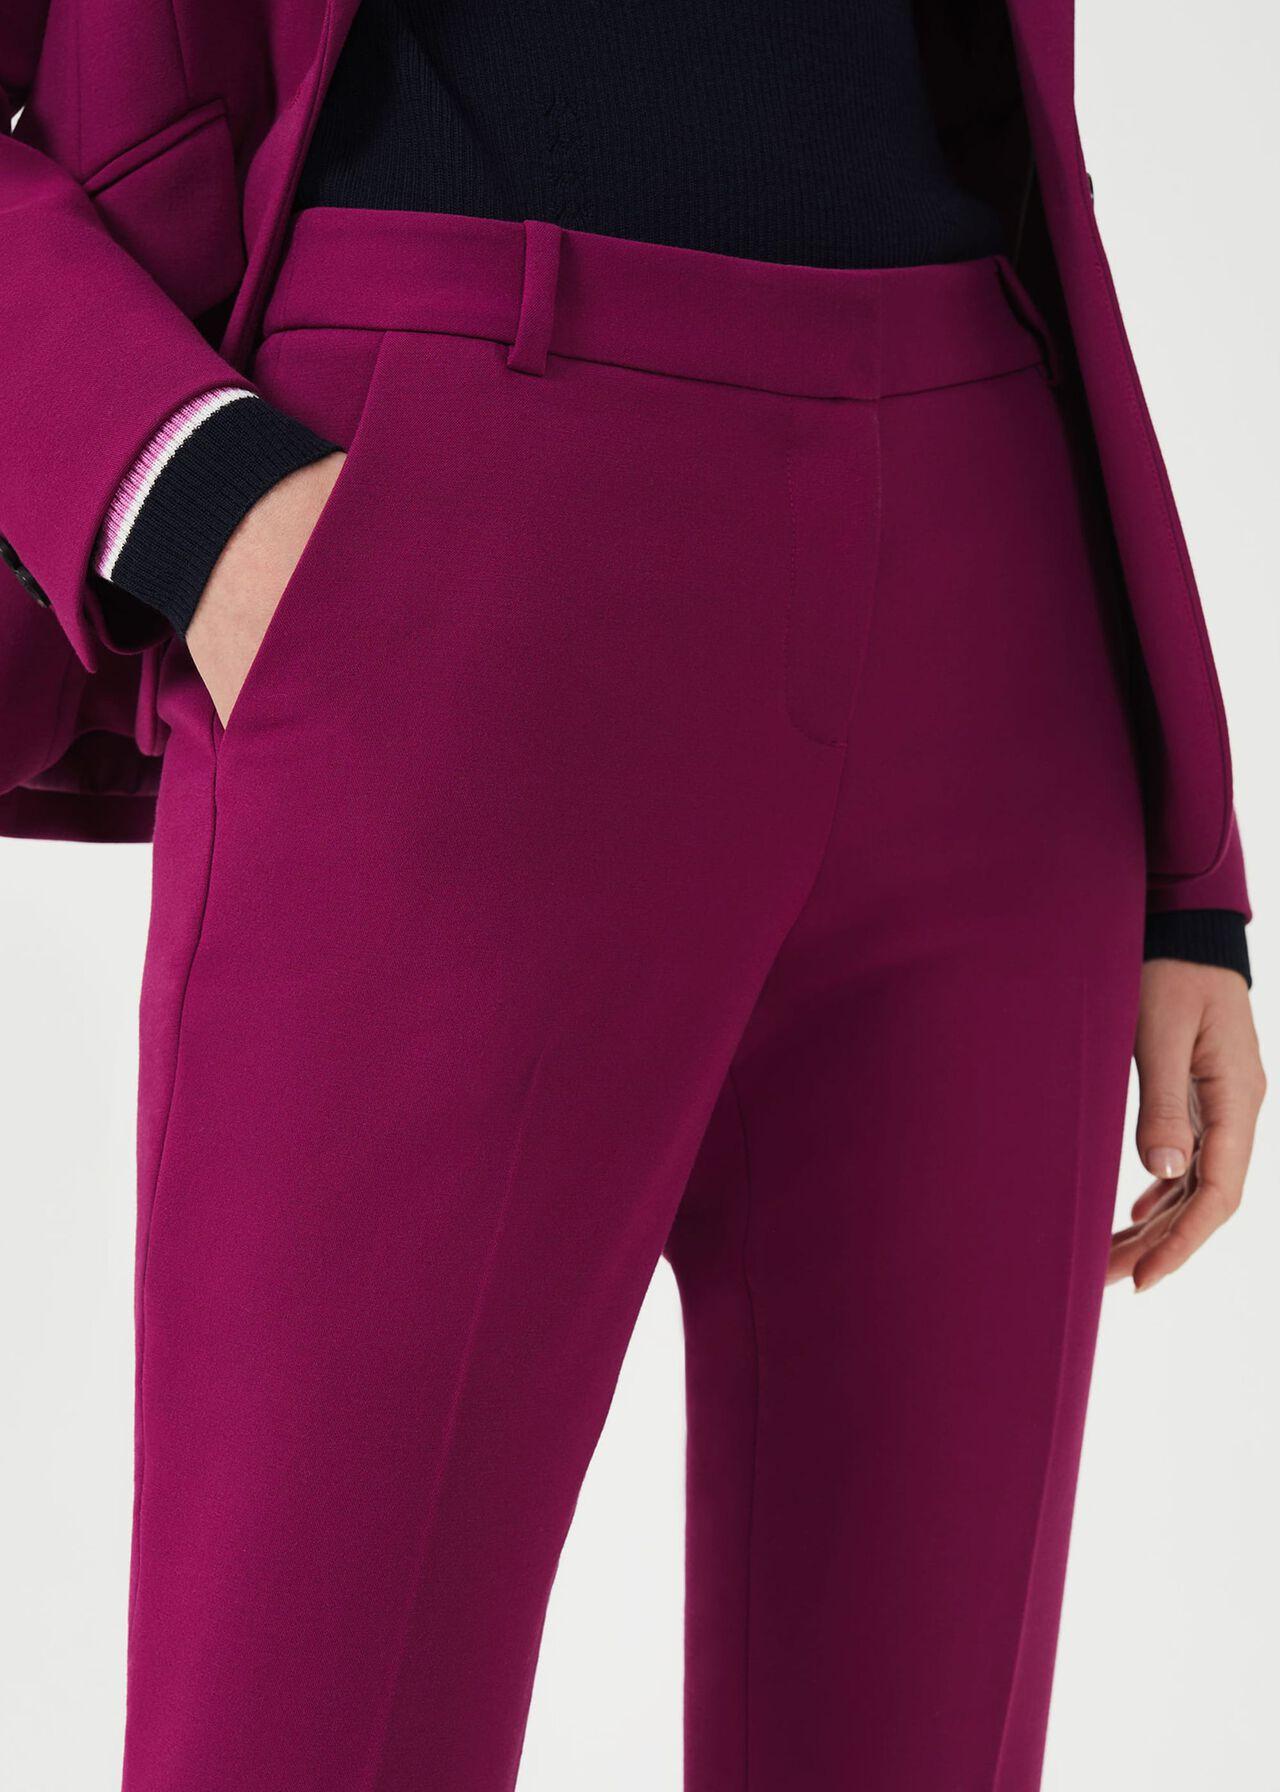 Suki Slim Trouser With Stretch, Magenta, hi-res